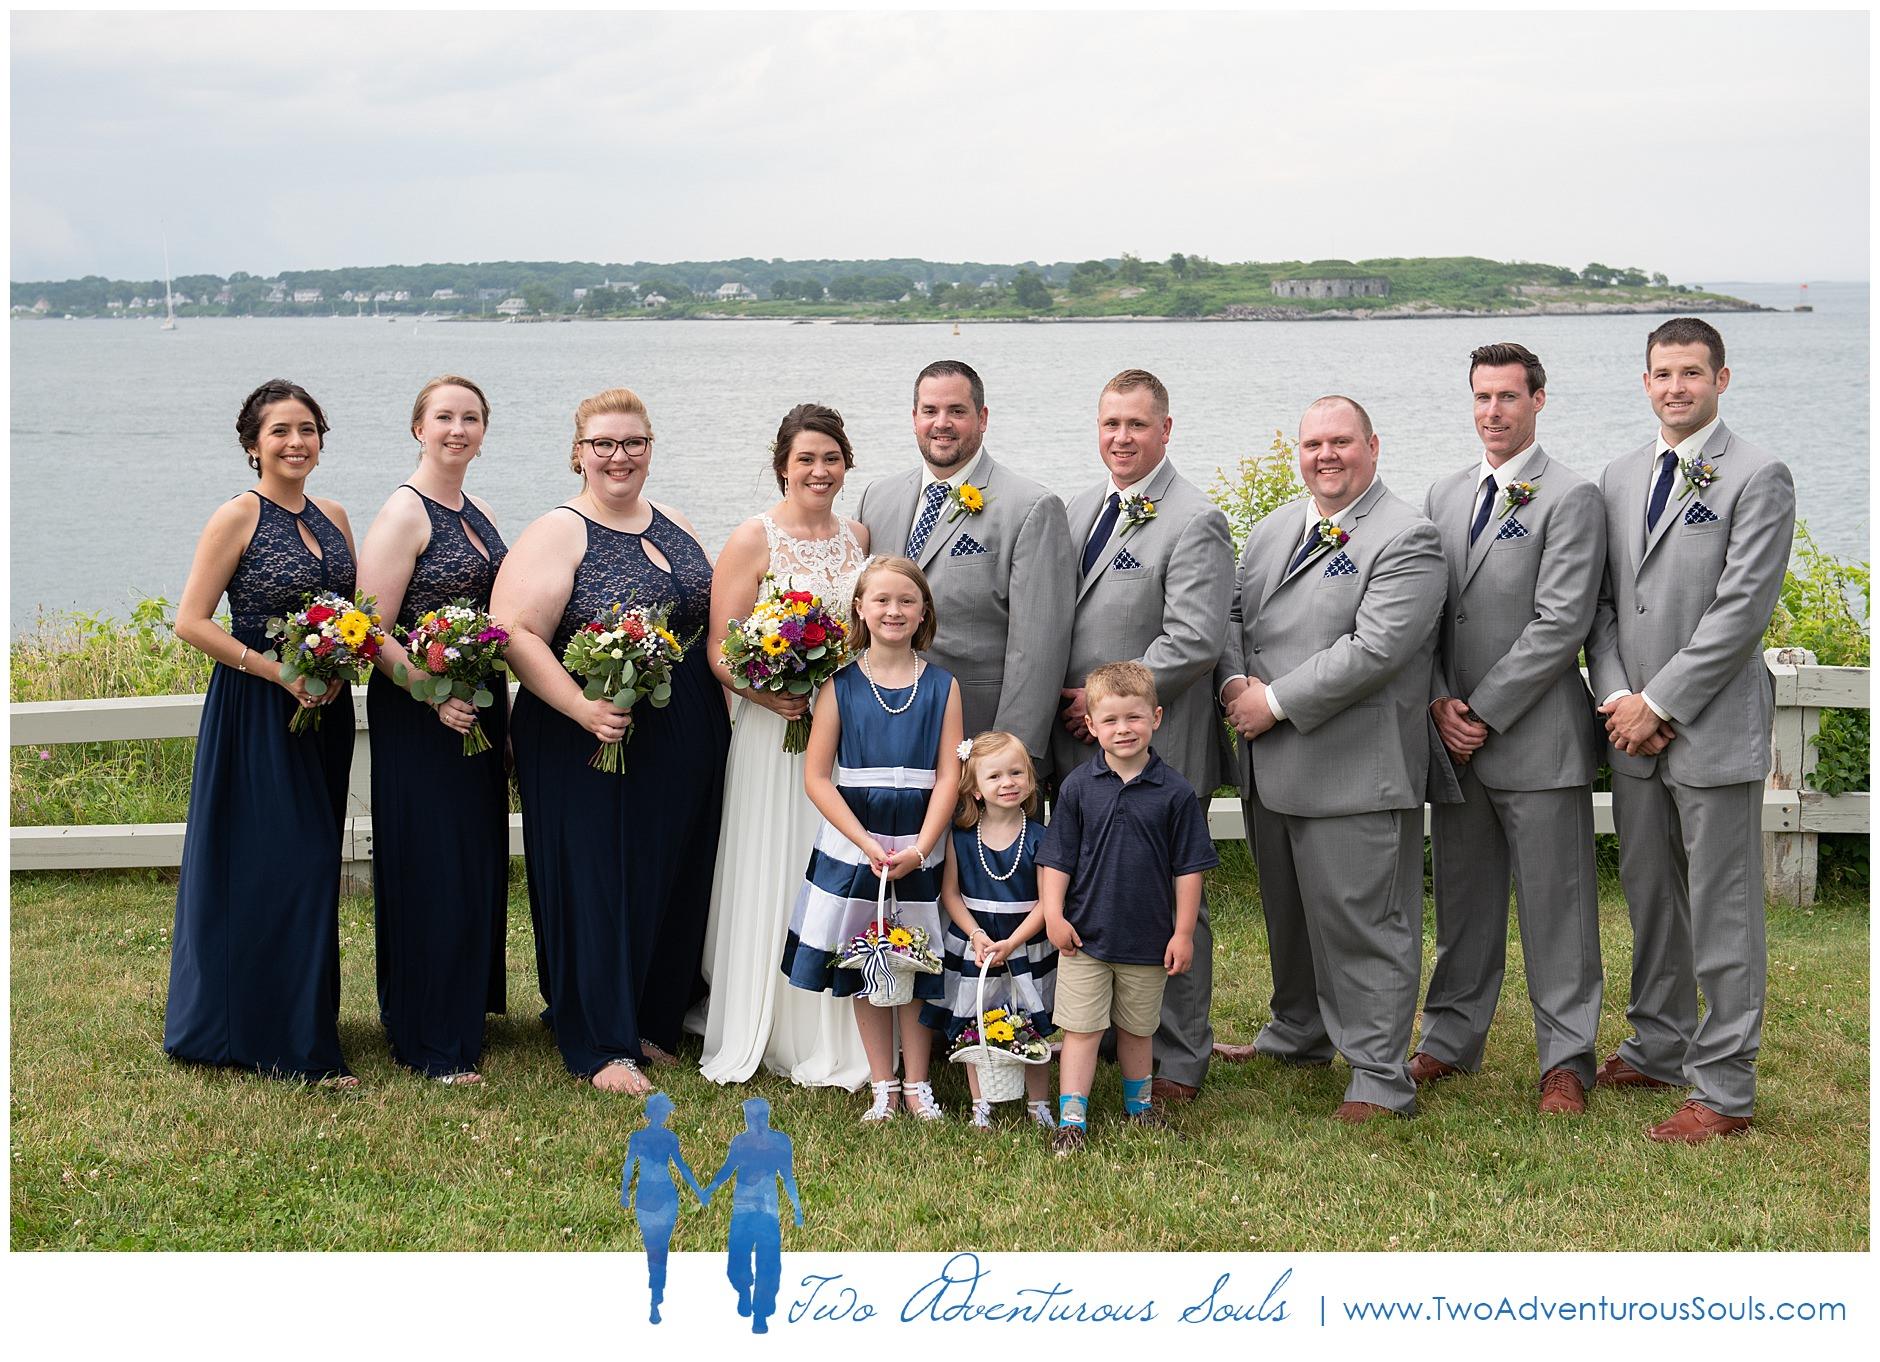 Maine Wedding Photographers, SMCC Wedding Photographers, Southern Maine Community College Wedding Photographers, Two Adventurous Souls-AshleyAaron_0032.jpg